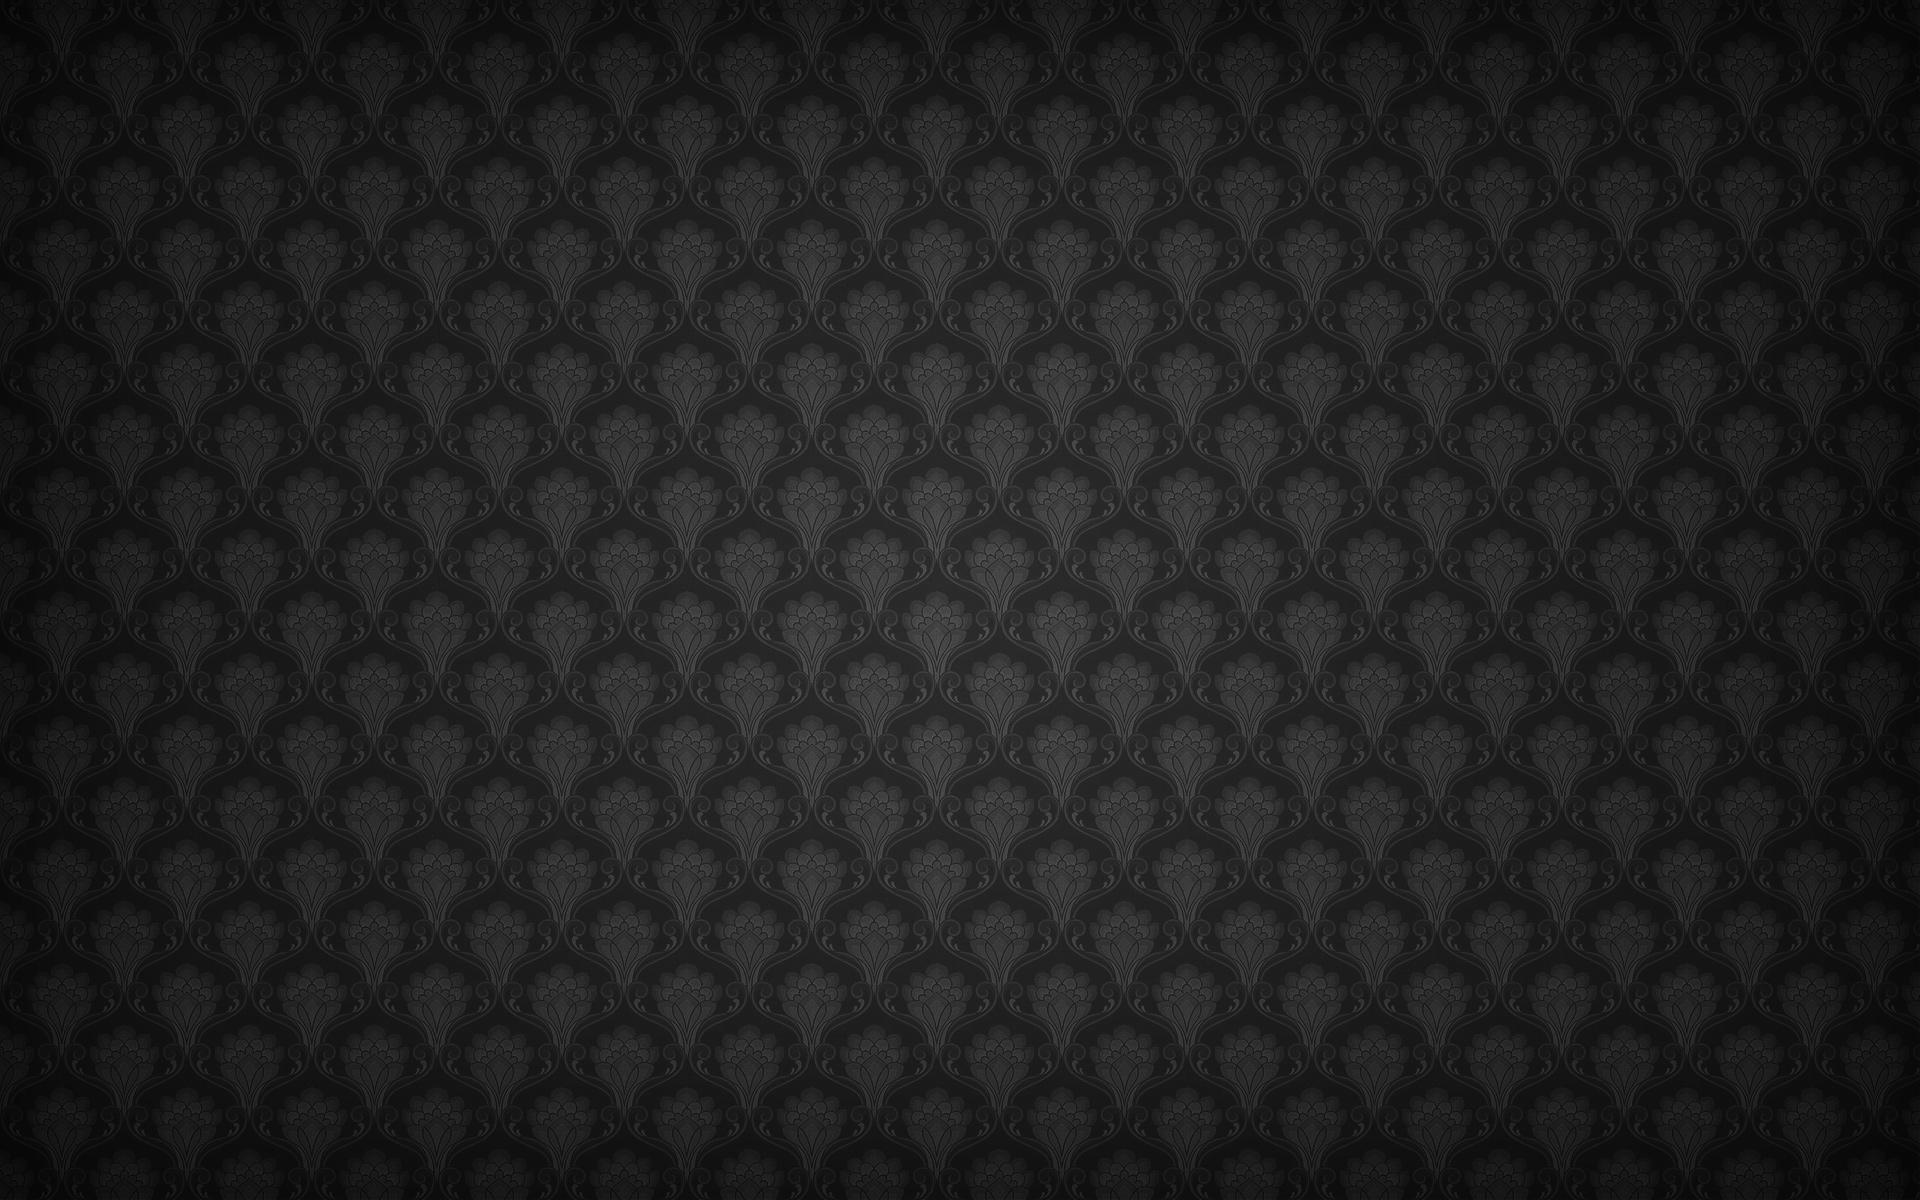 black pattern wallpaper hd